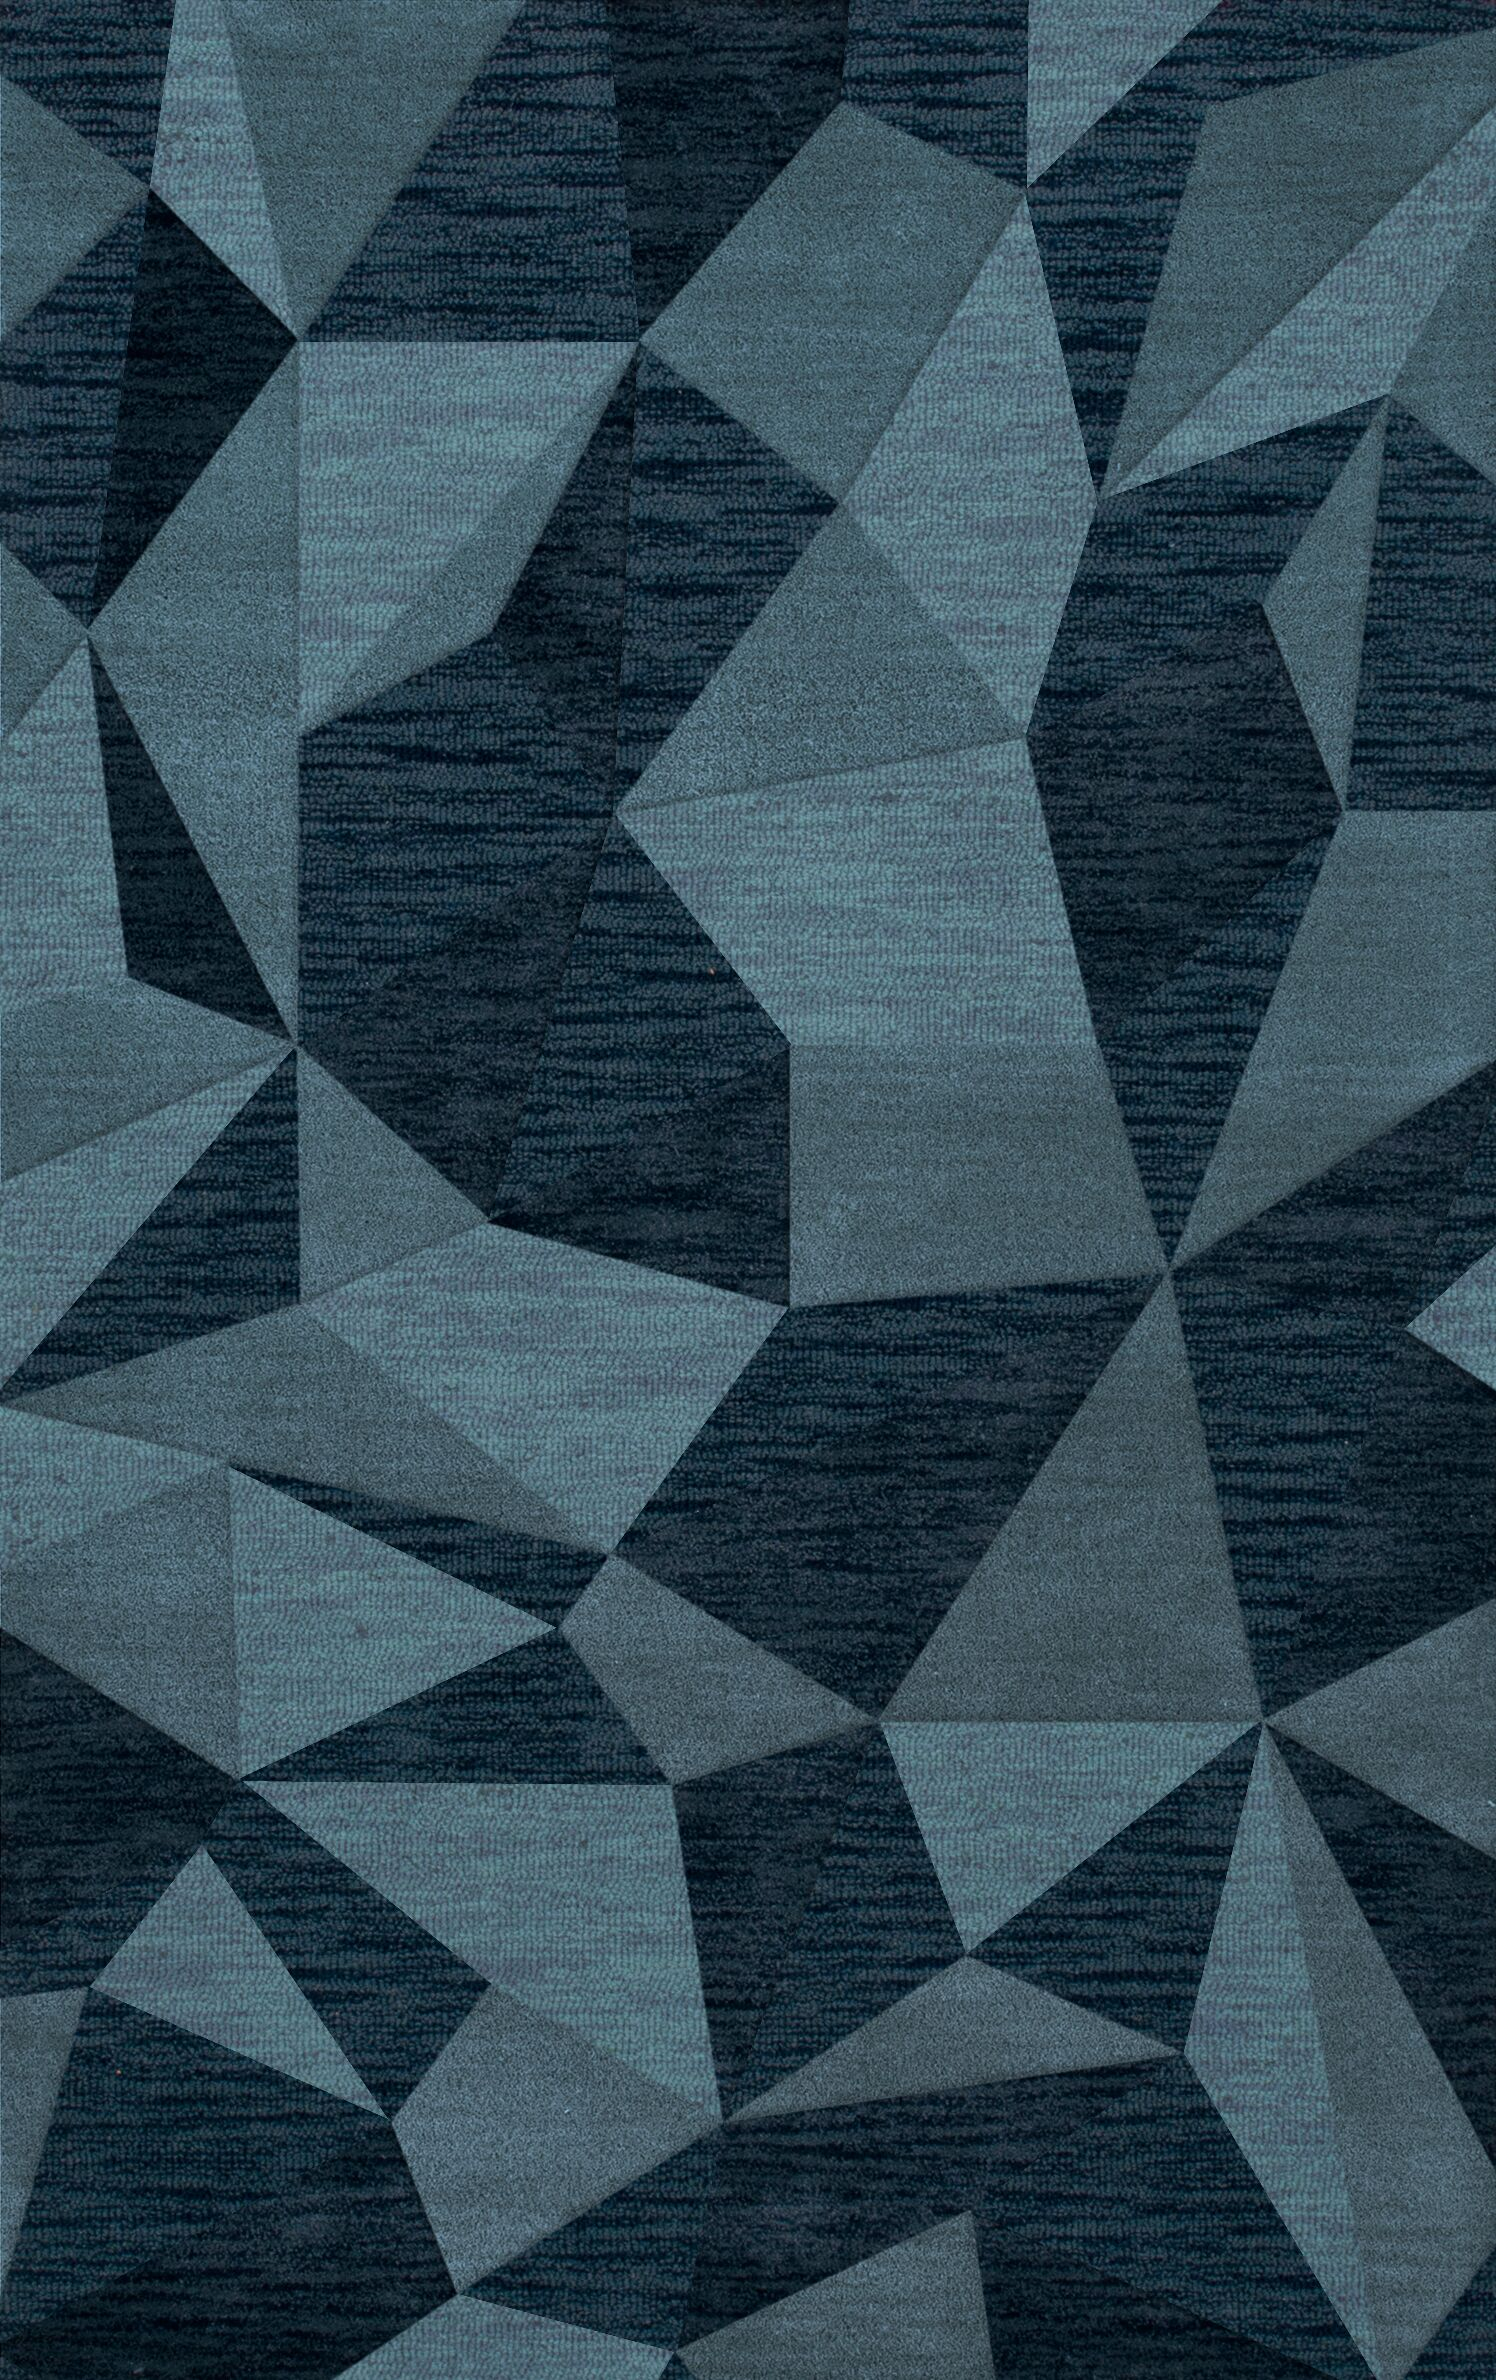 Bella Machine Woven Wool Blue Area Rug Rug Size: Rectangle 6' x 9'